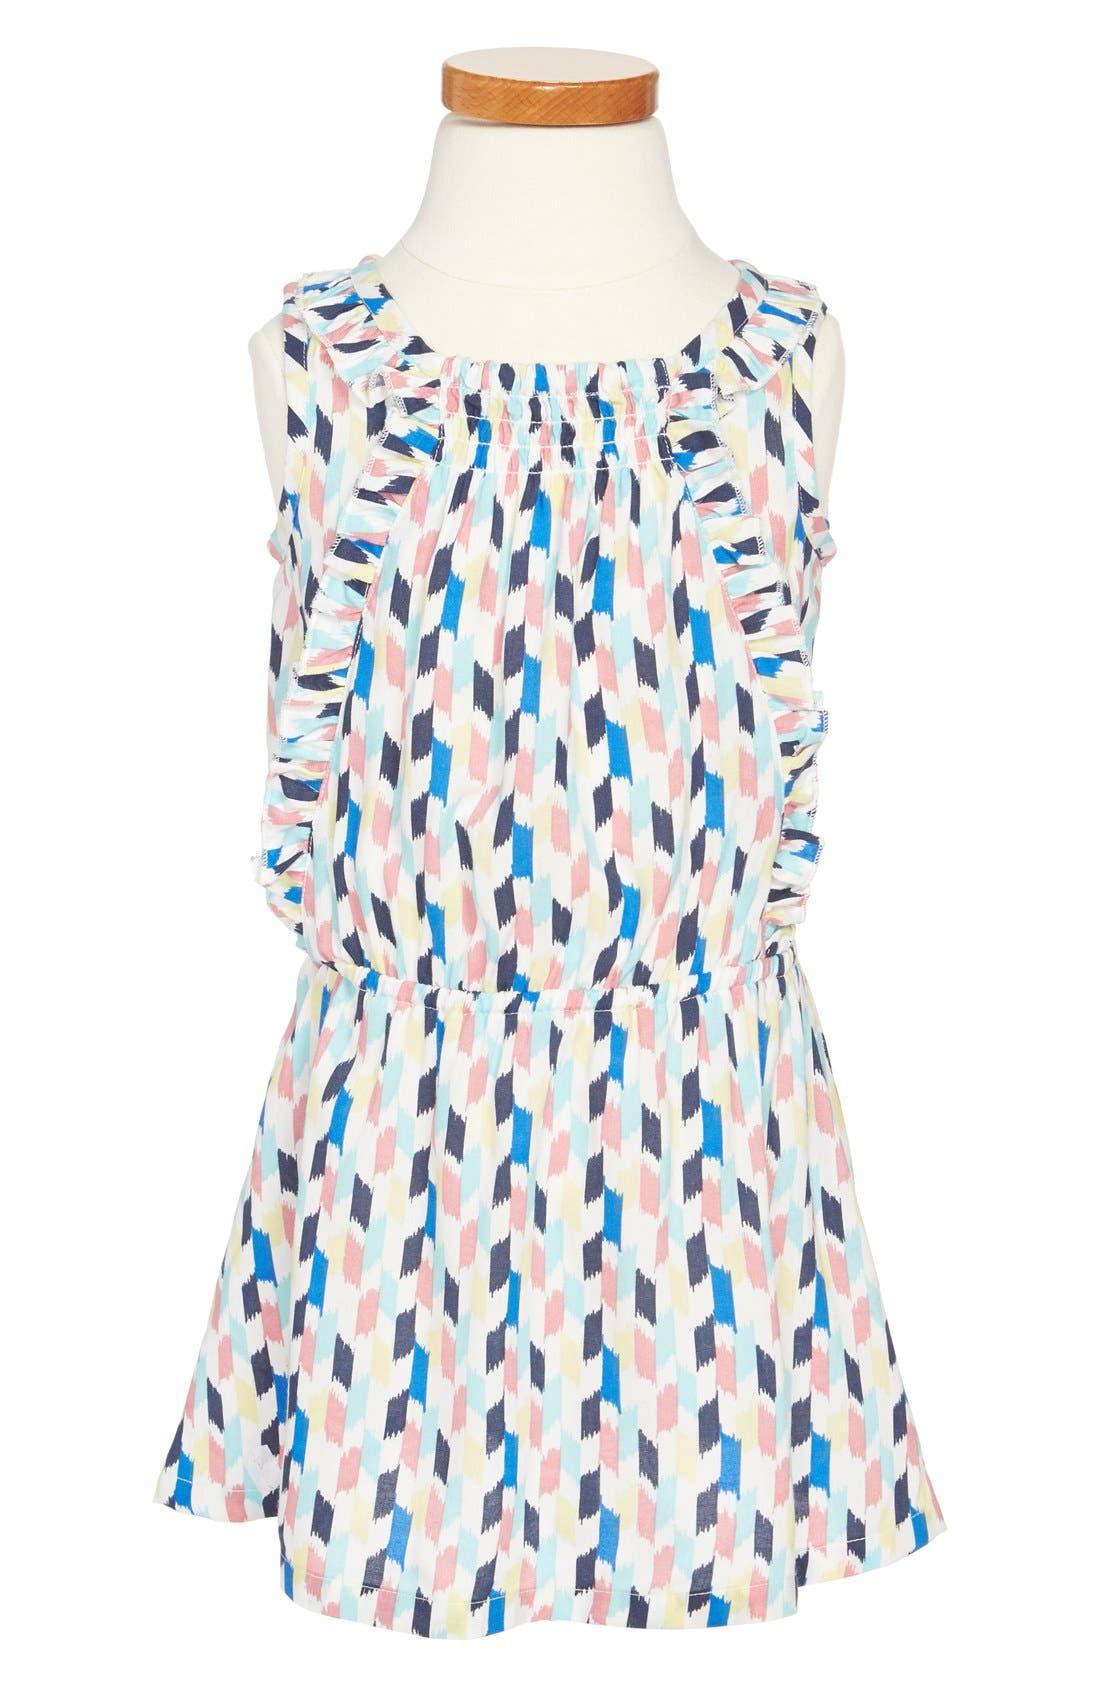 Main Image - Tucker + Tate 'Emeline' Ikat Print Dress (Toddler Girls, Little Girls & Big Girls)